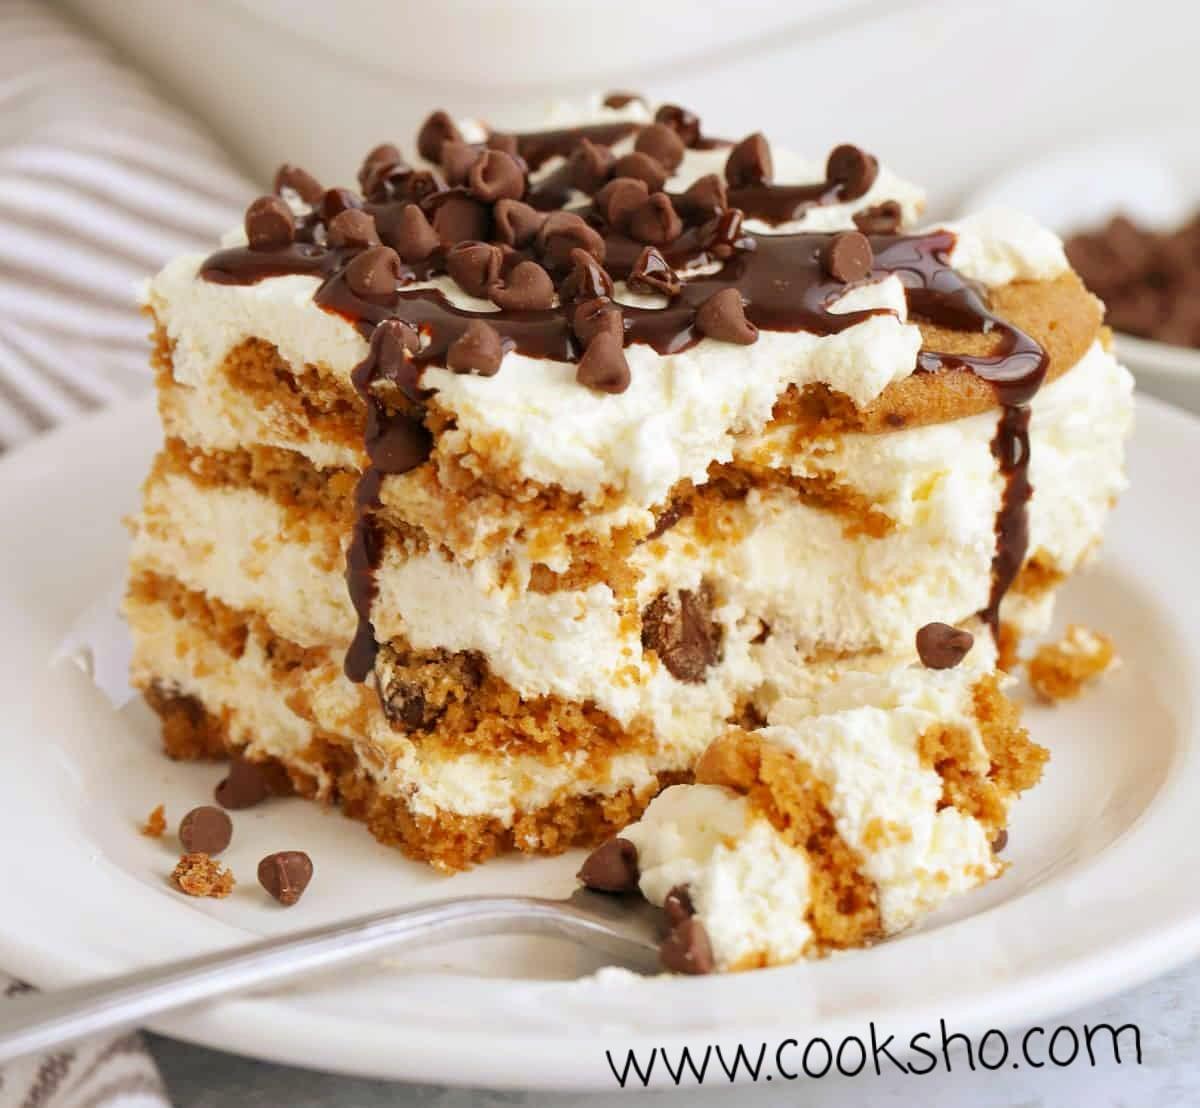 کیک یخچالی موزی شکلاتی